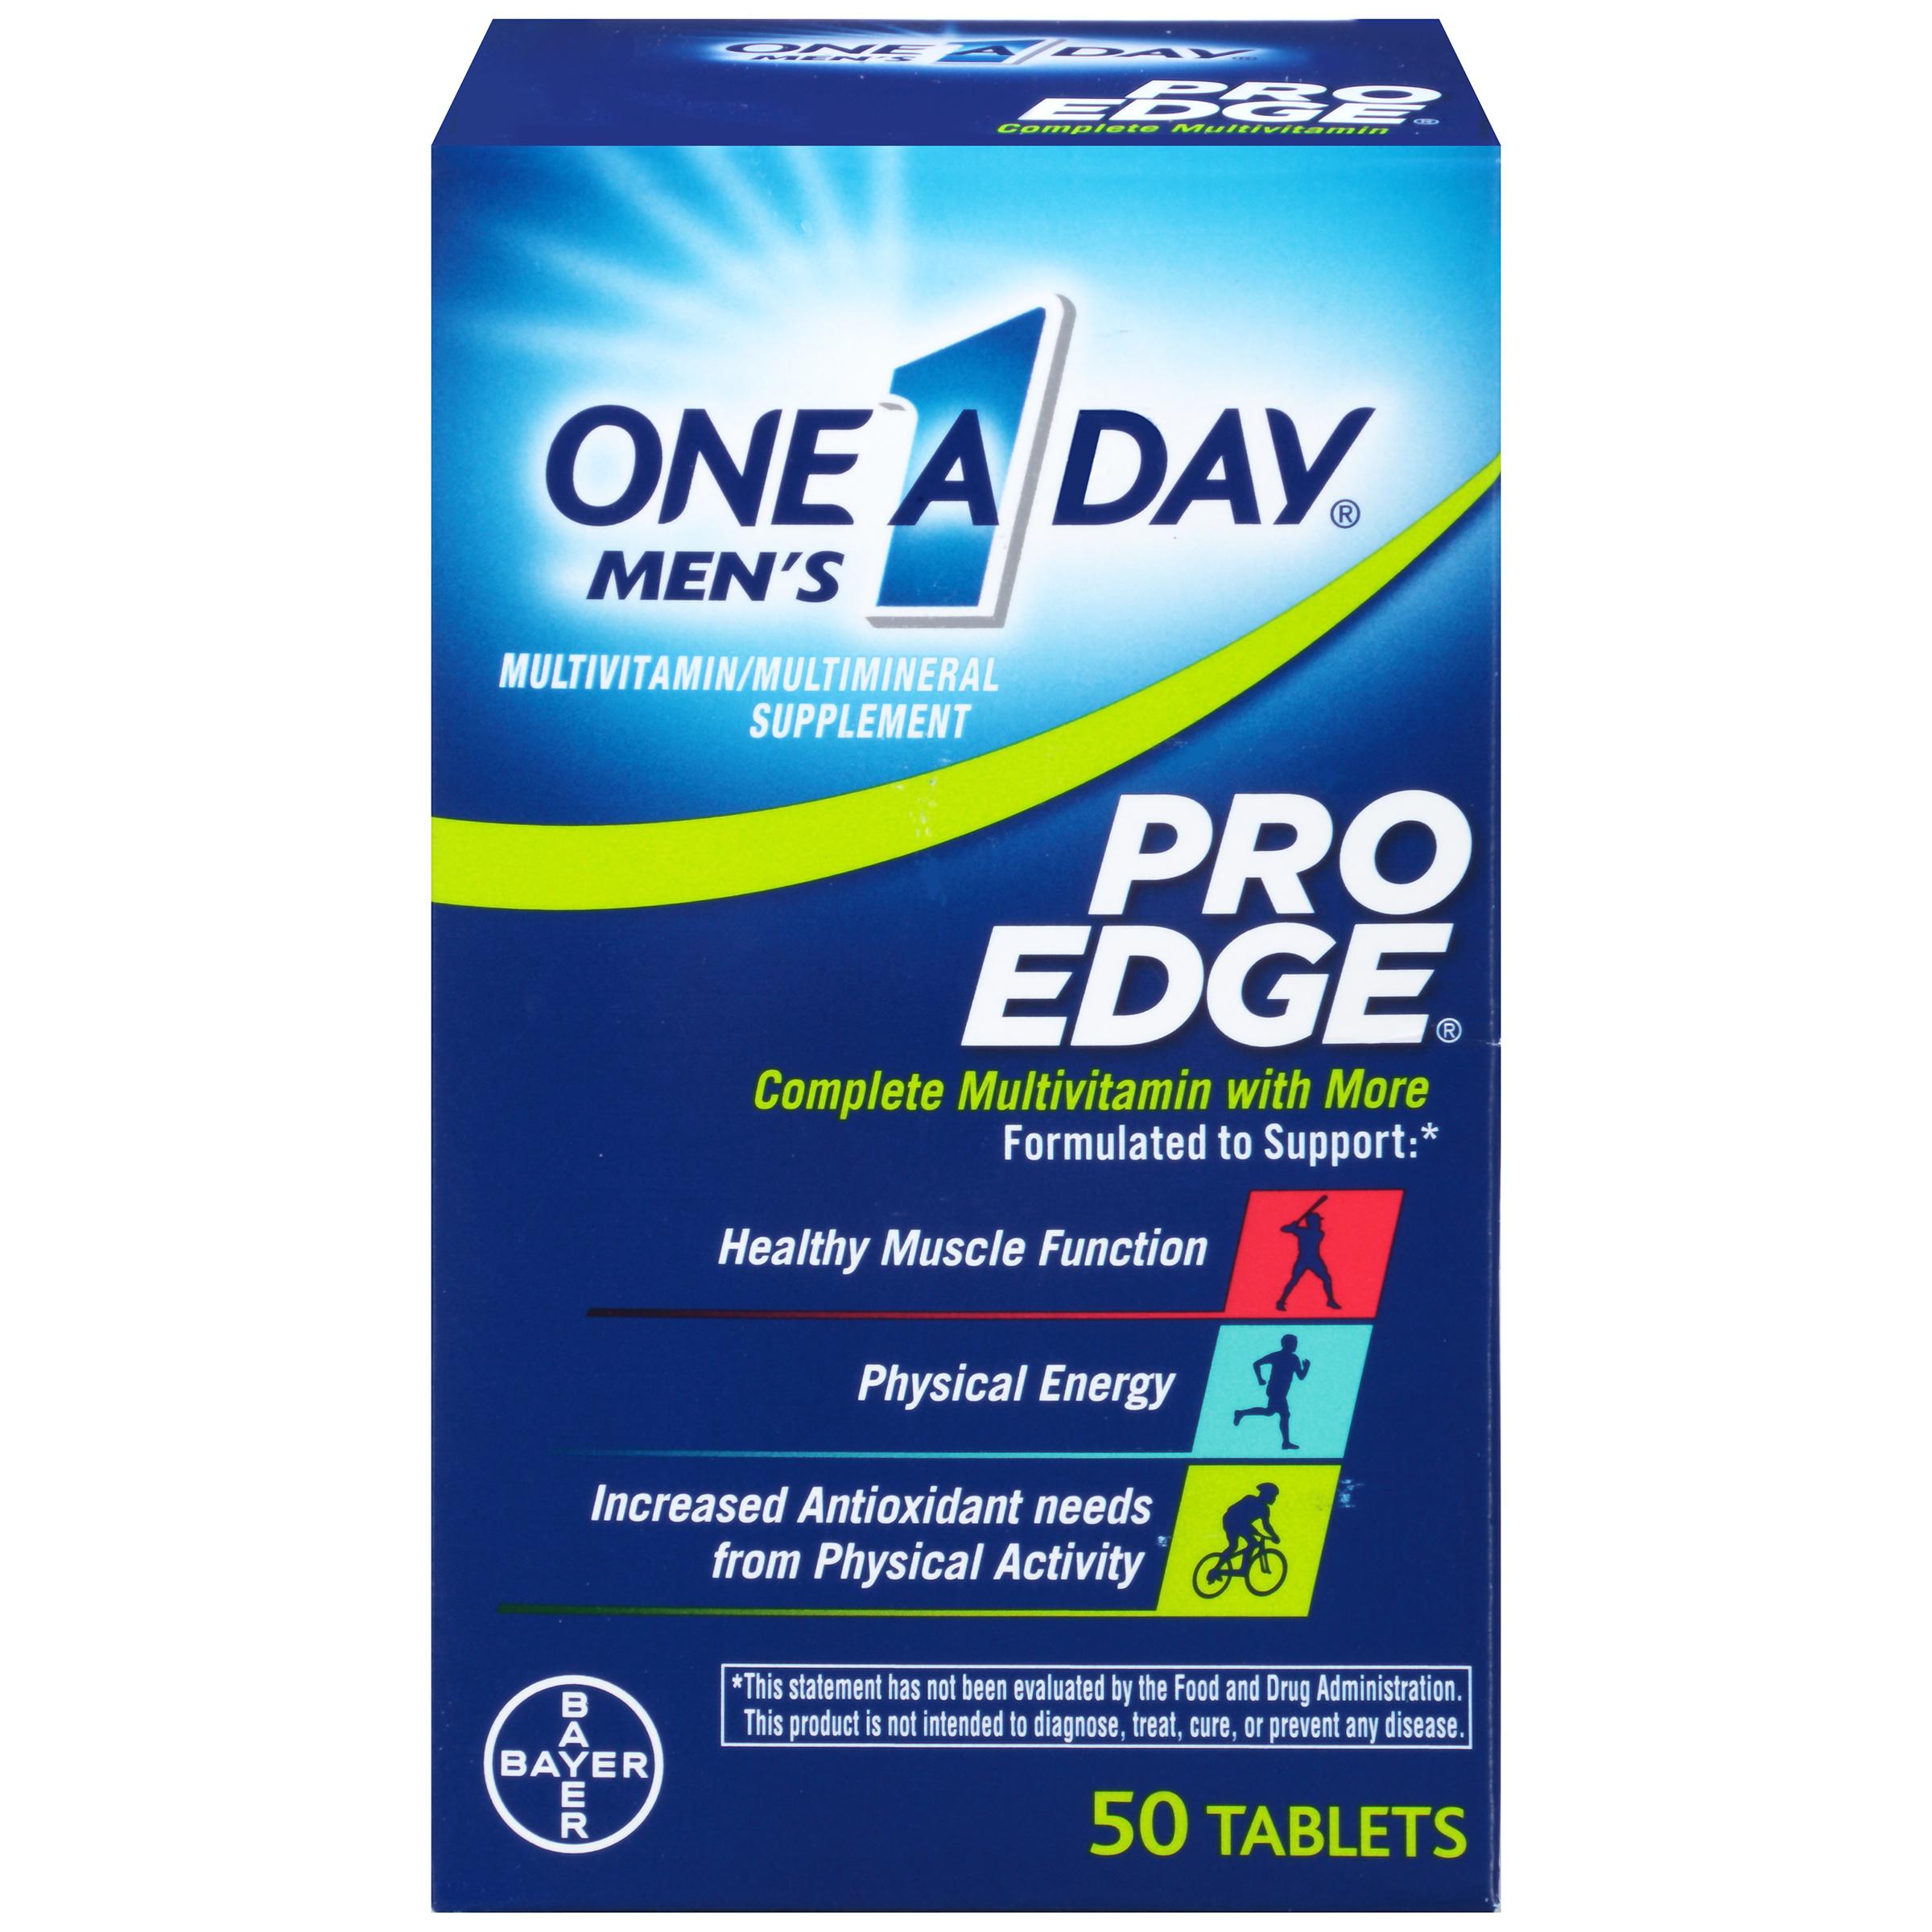 One A Day Men's Pro Edge Multivitamin, 50 Count